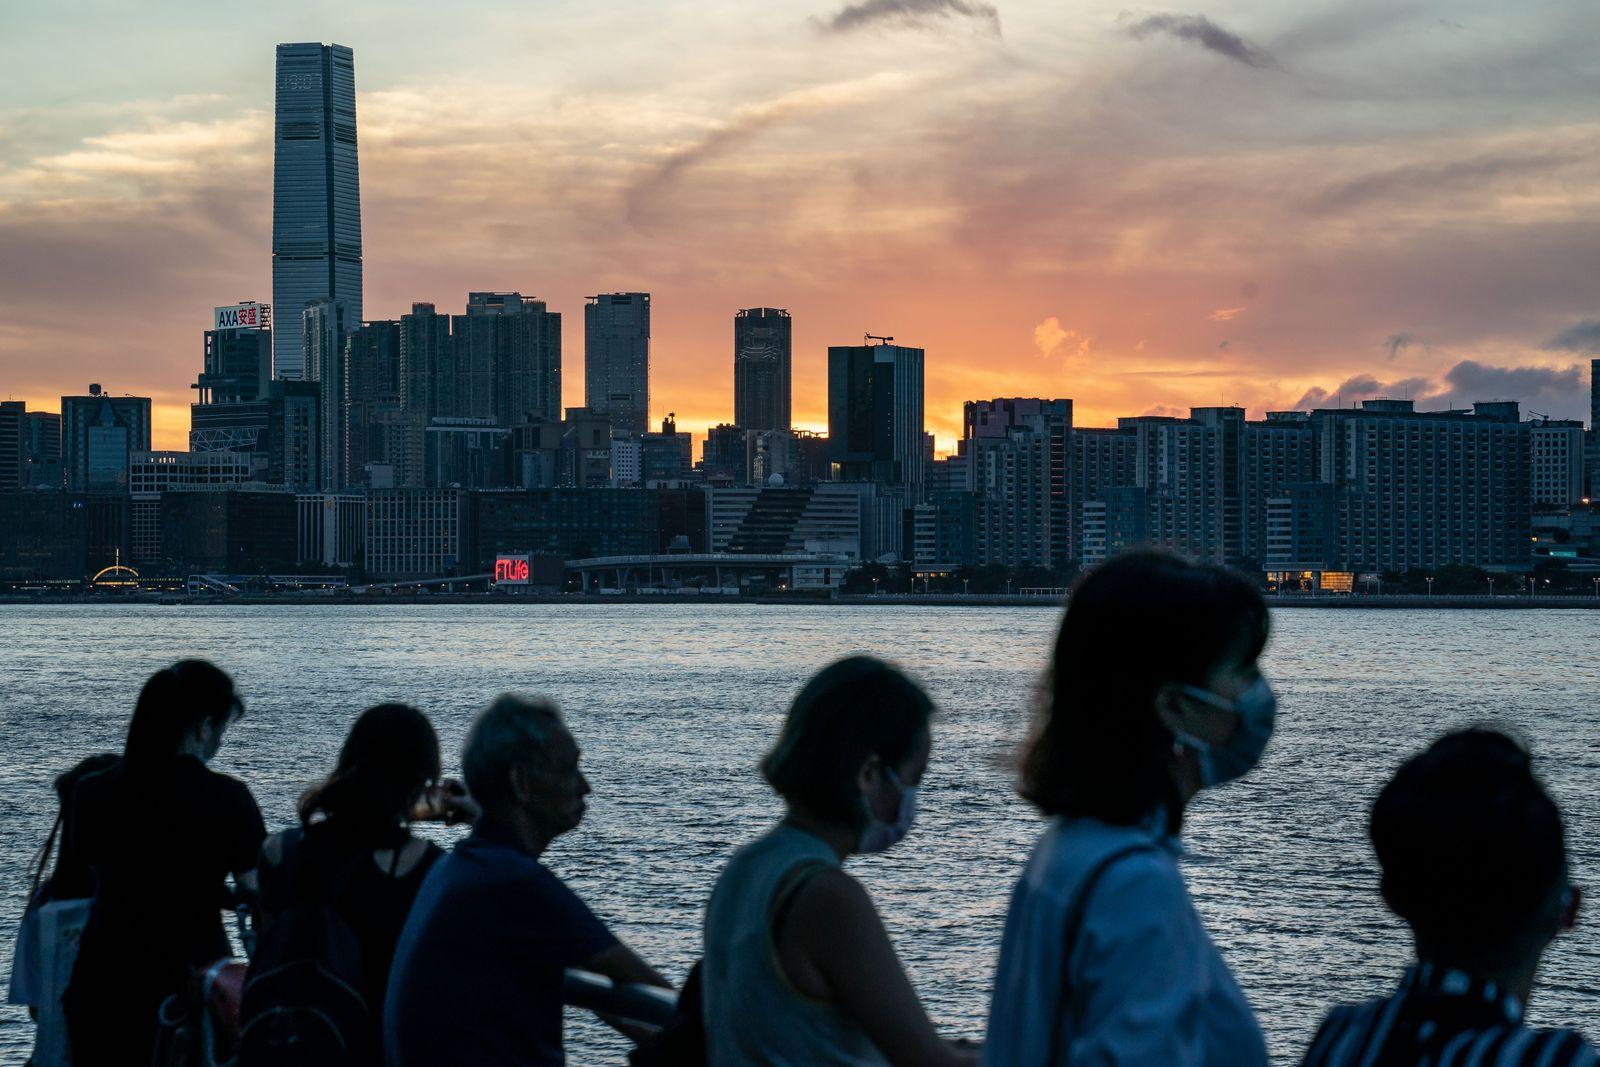 Hong Kong Impose Restrictions As Coronavirus Cases Begin To Rise